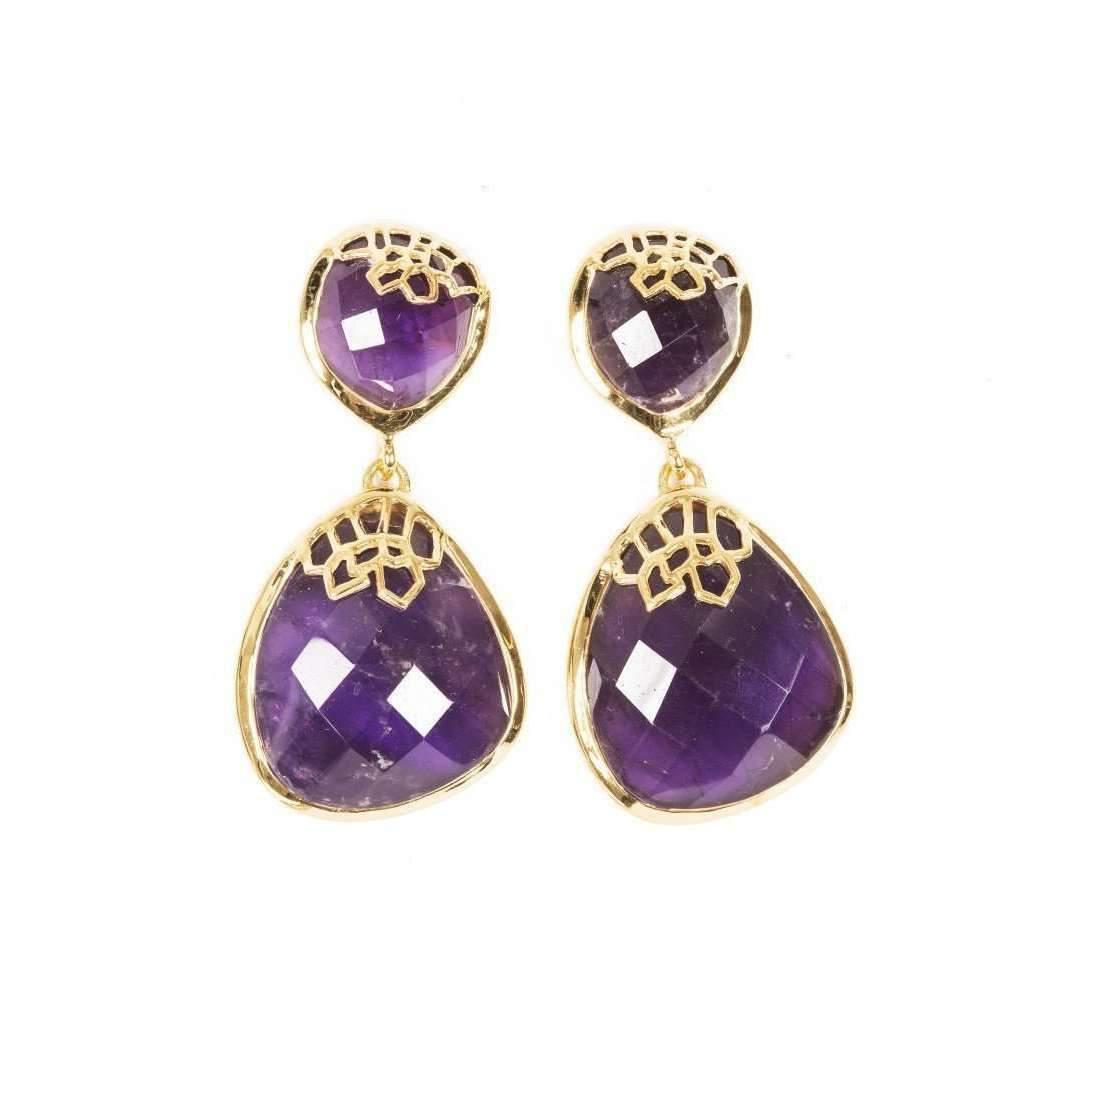 Neola Honeycomb Gold Drop Earrings rmmVPGgz8R